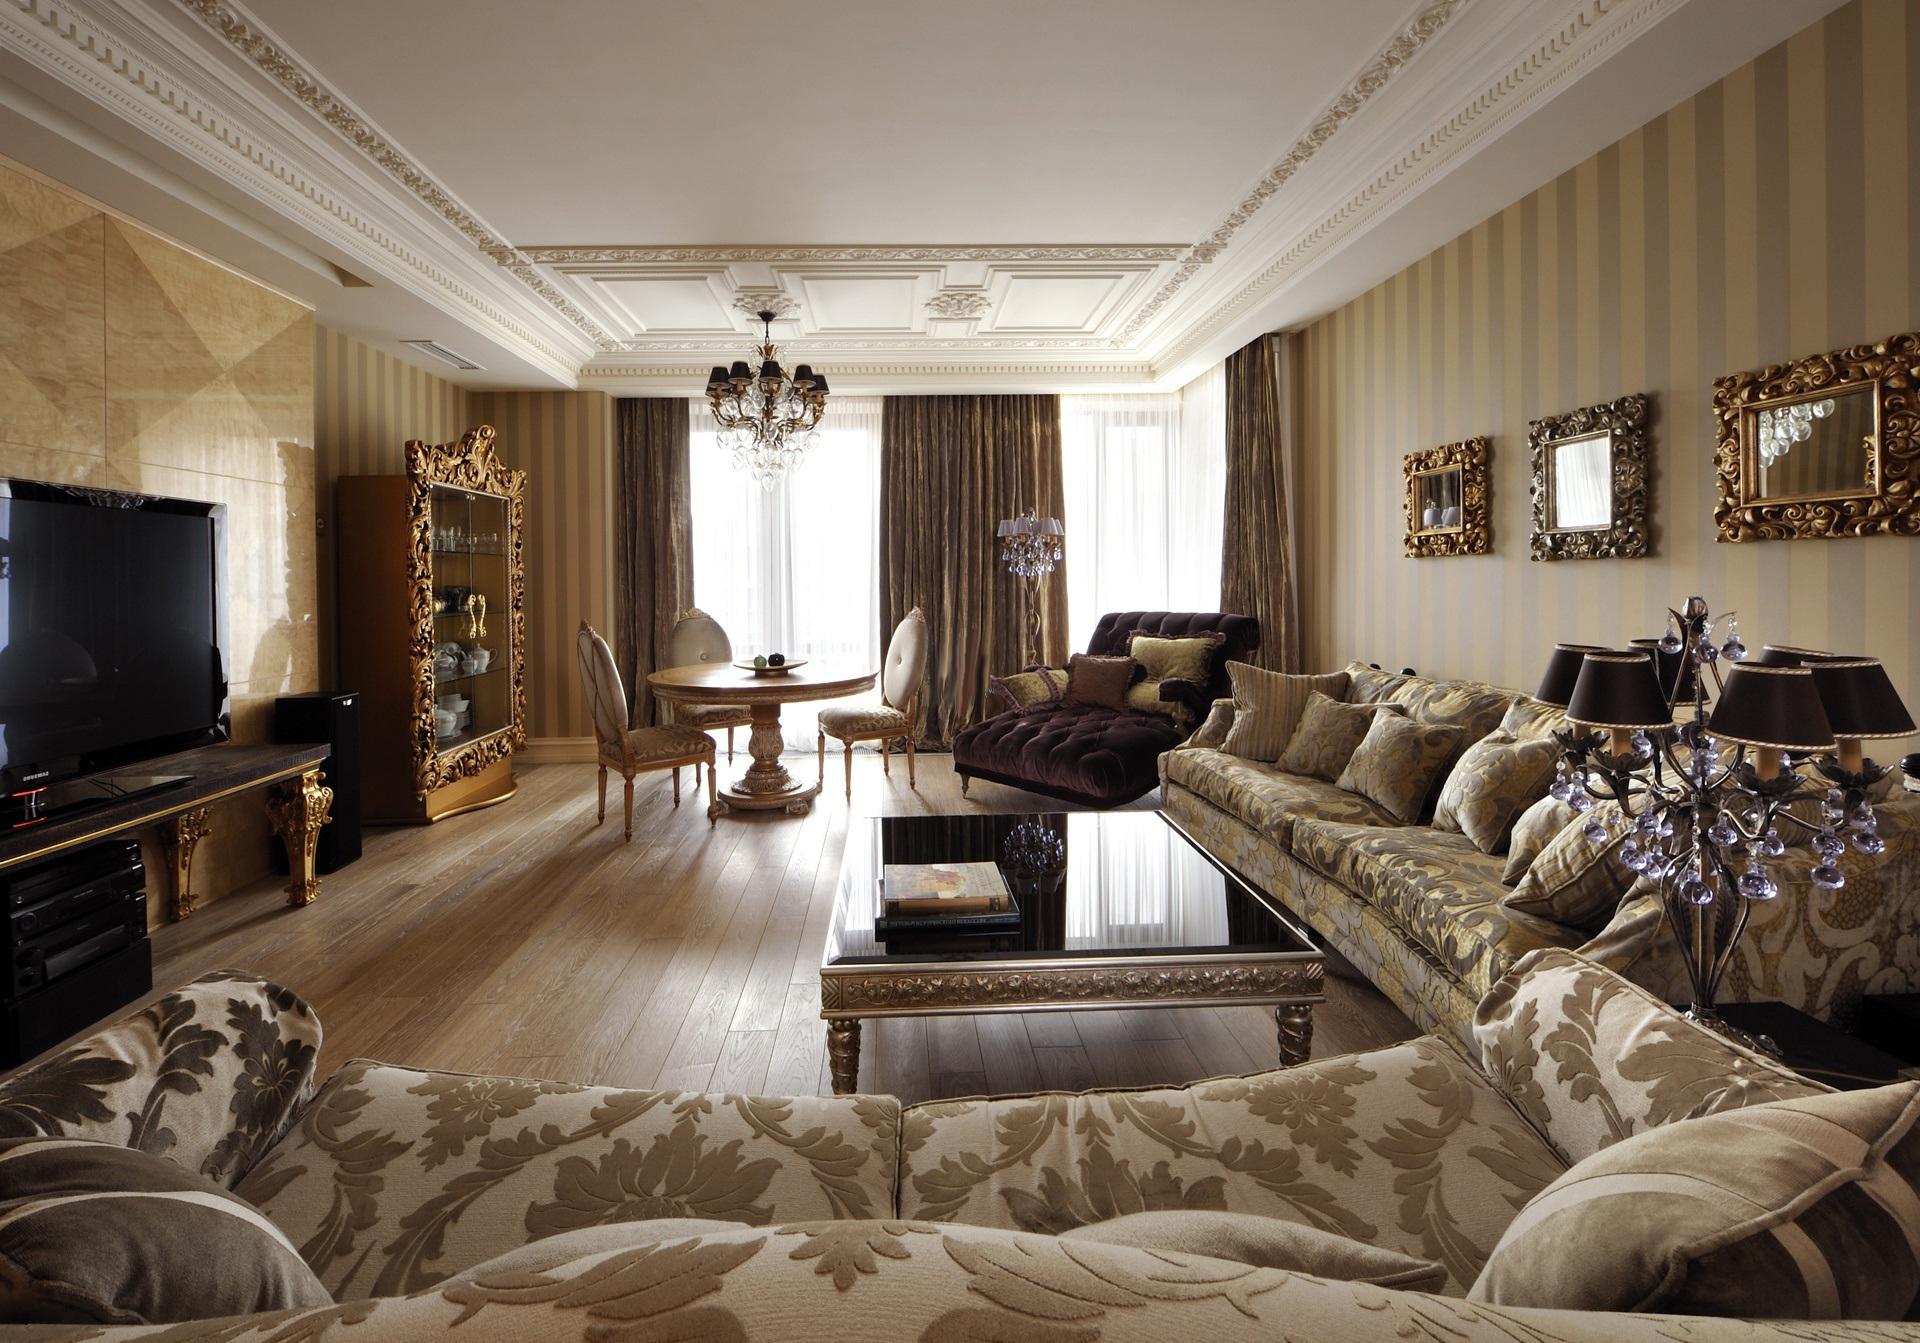 lengvo art deco stiliaus namai